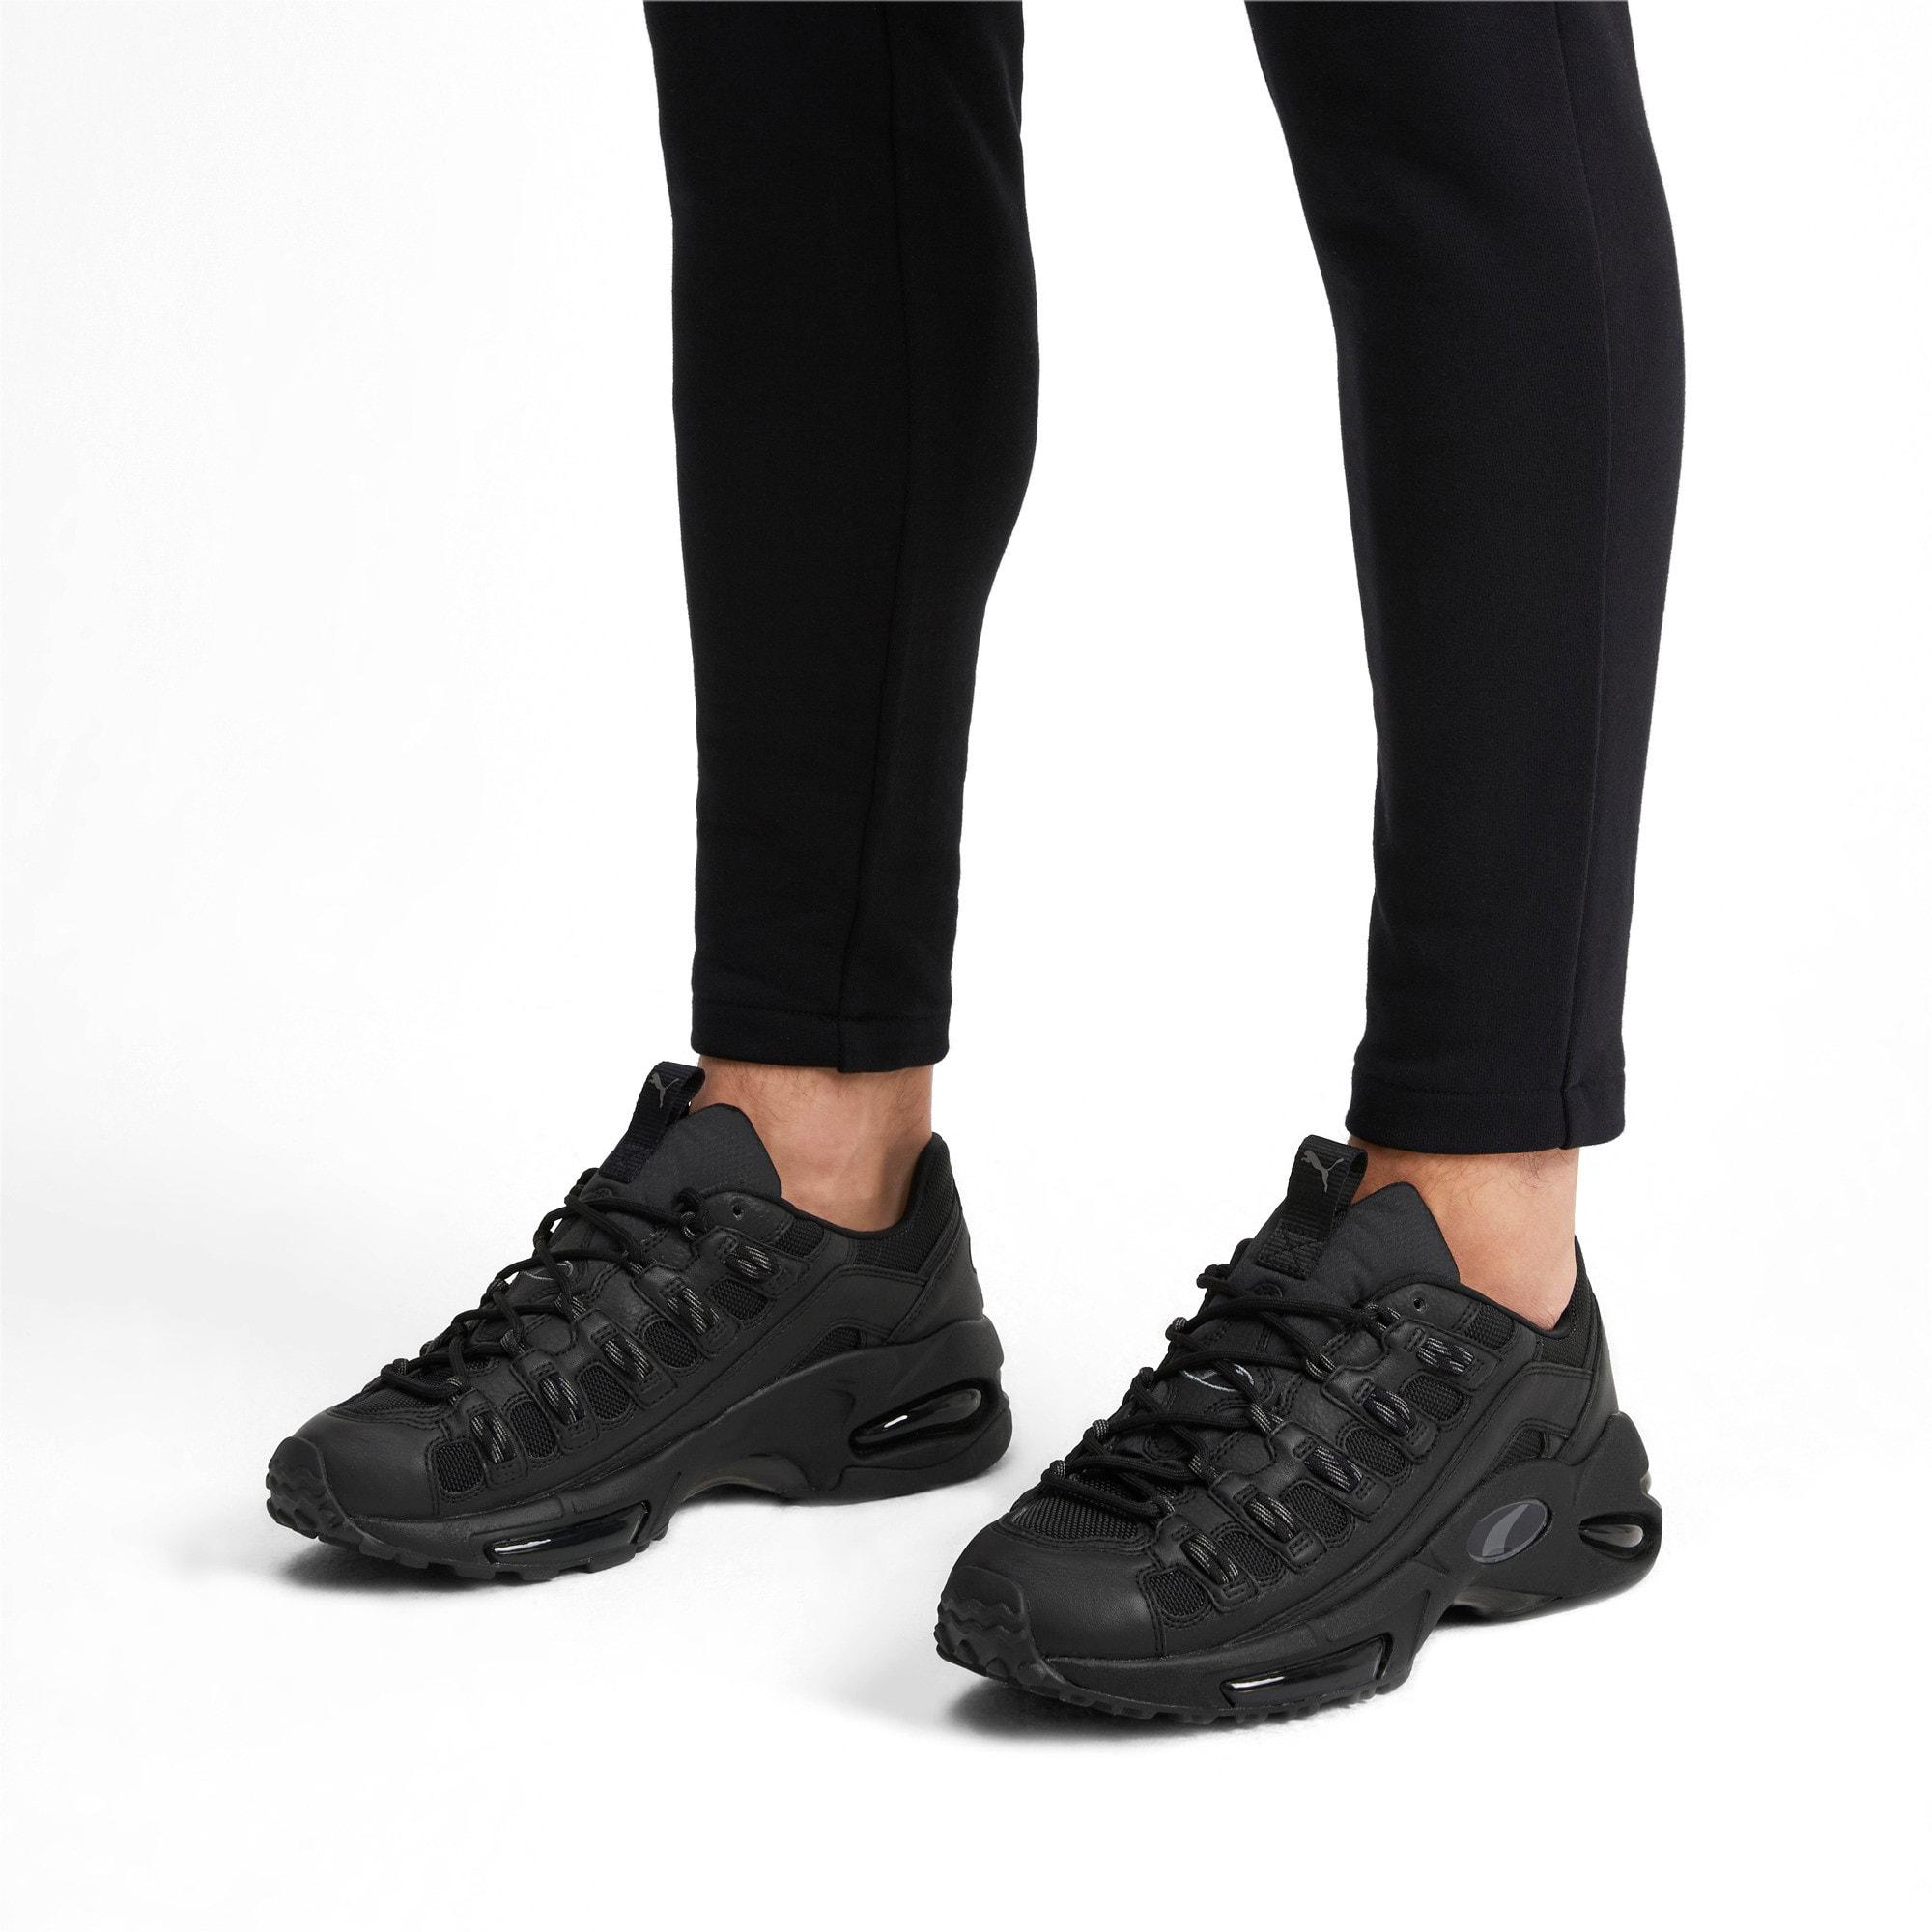 Thumbnail 2 of CELL Endura Rebound Sneakers, Puma Black-Puma Black, medium